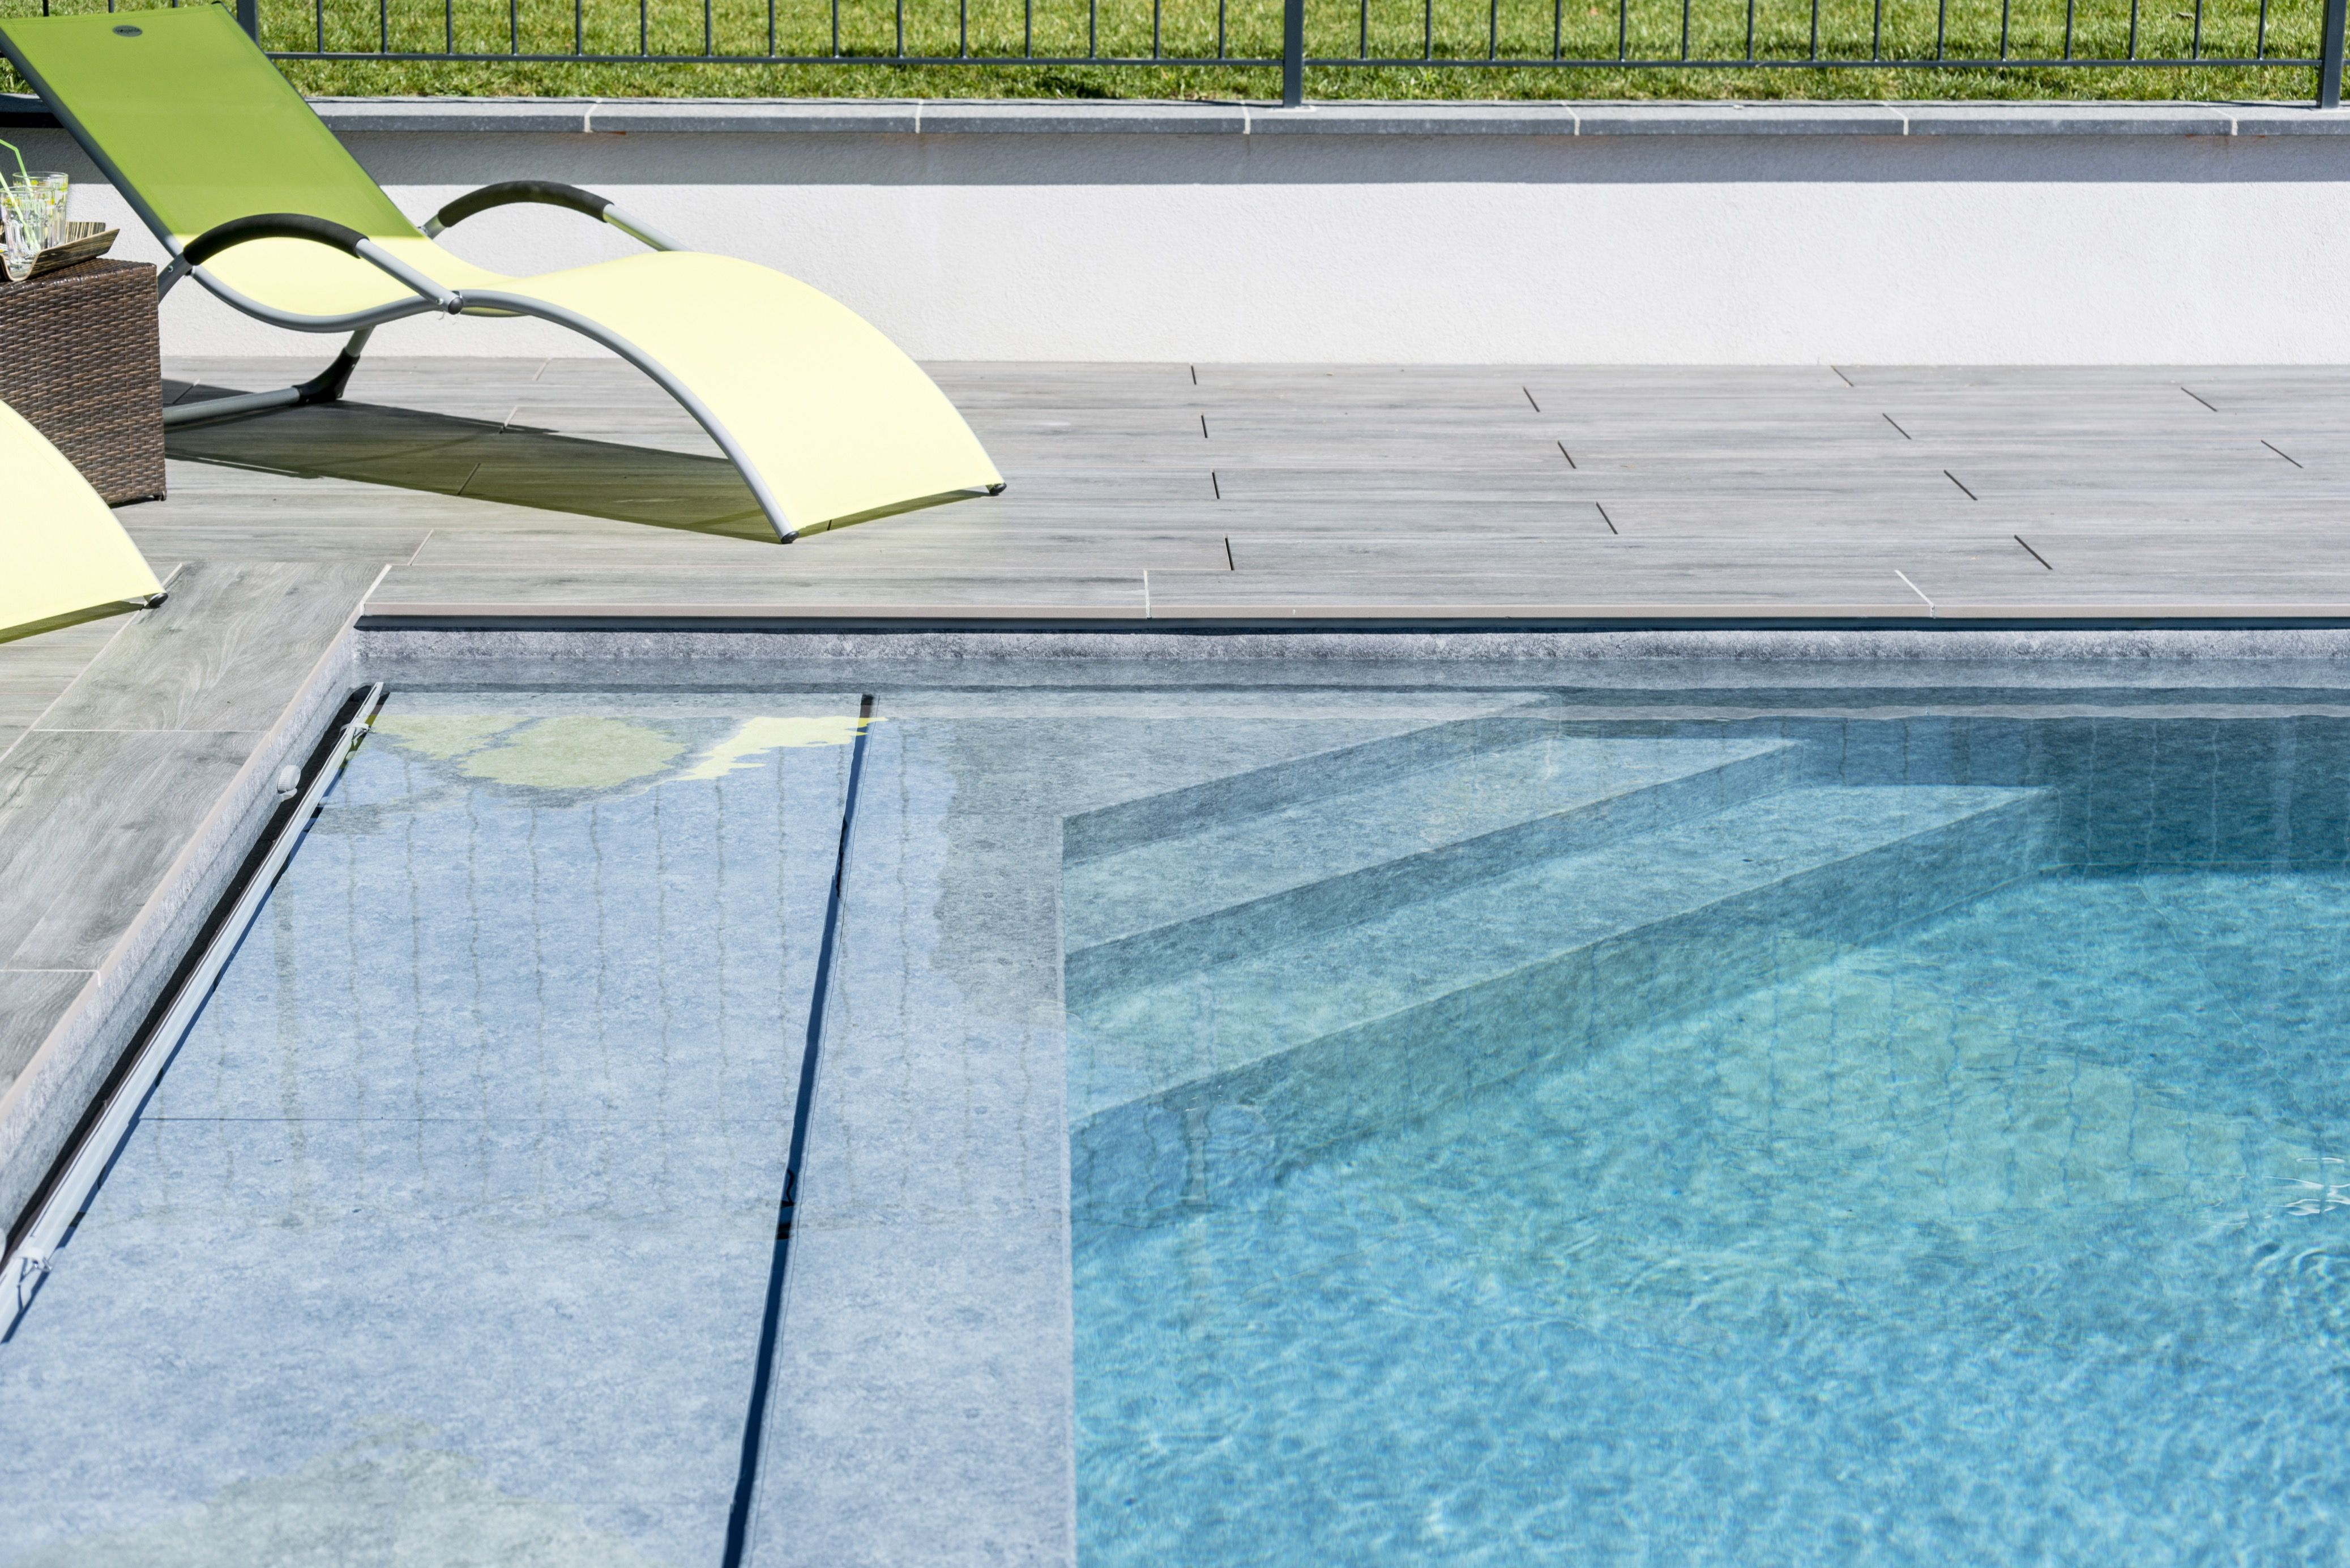 Stairs Swimmingpool Living Poolideas Pool Inground Surrounds